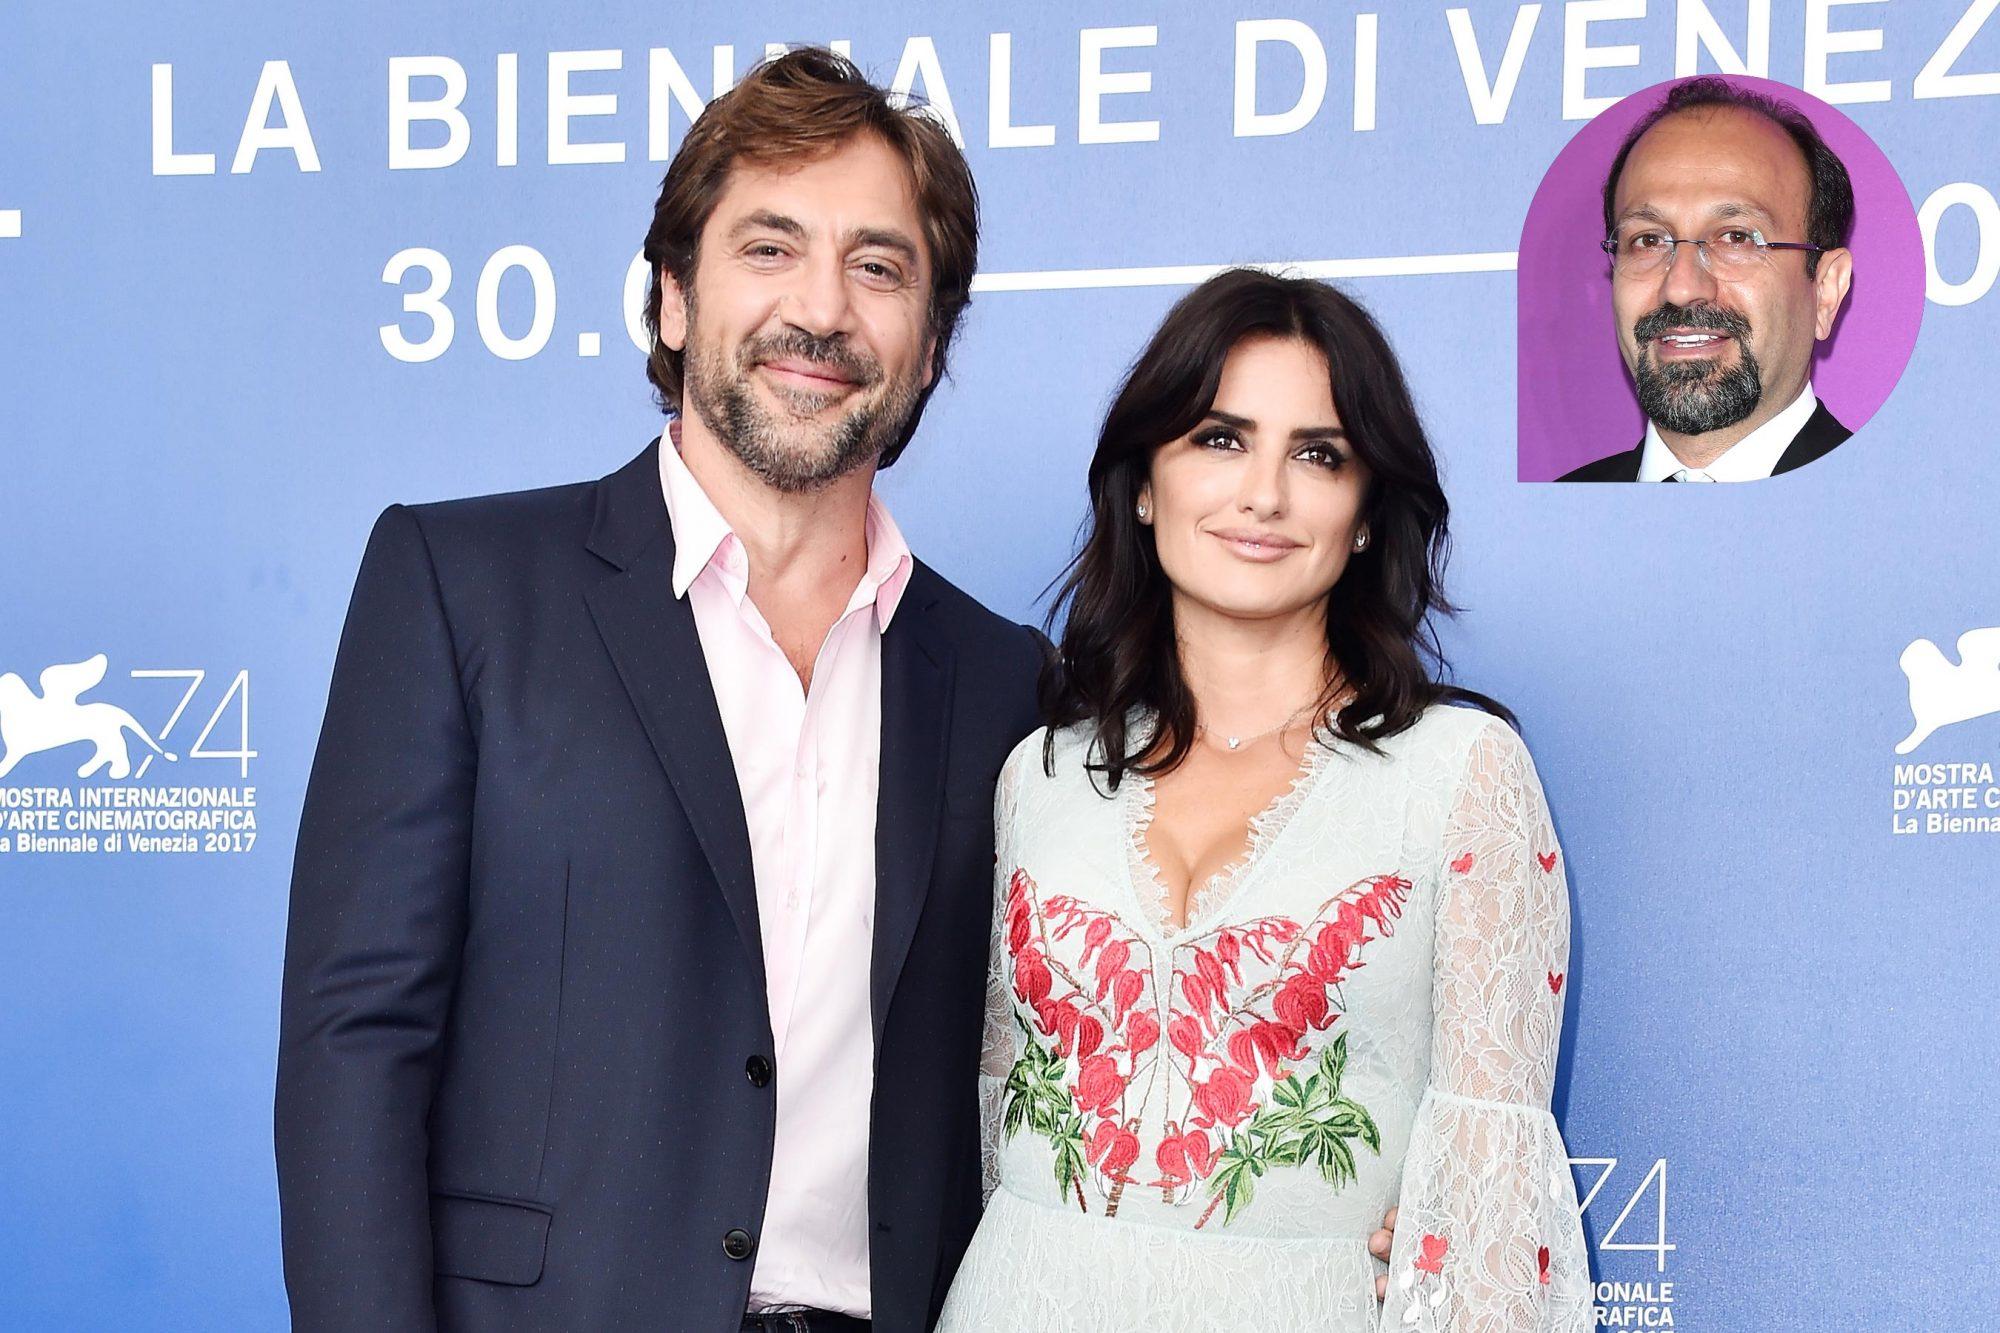 Asghar-Farhadi-Penelope-Cruz-Javier-Bardem